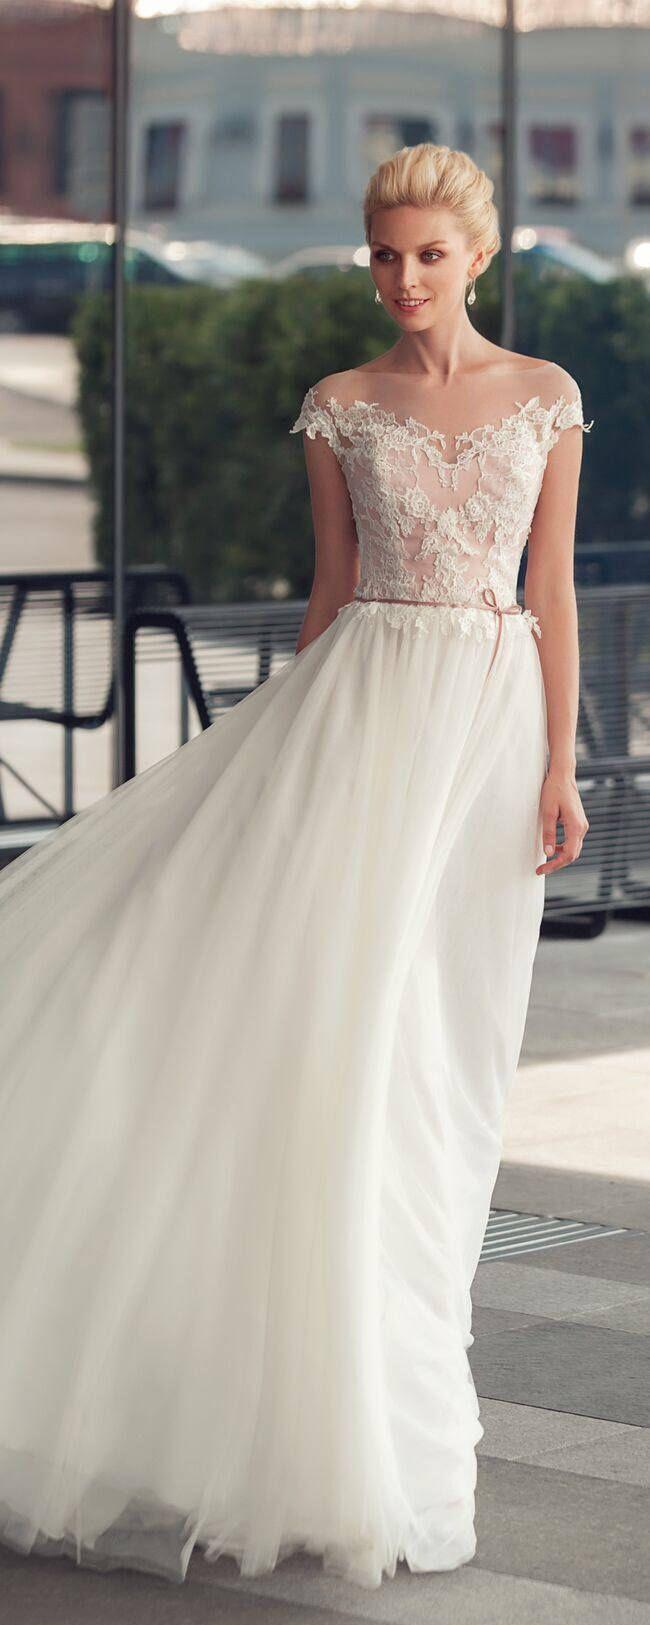 Ivory lace dress boho wedding dress lace dress bohemian wedding